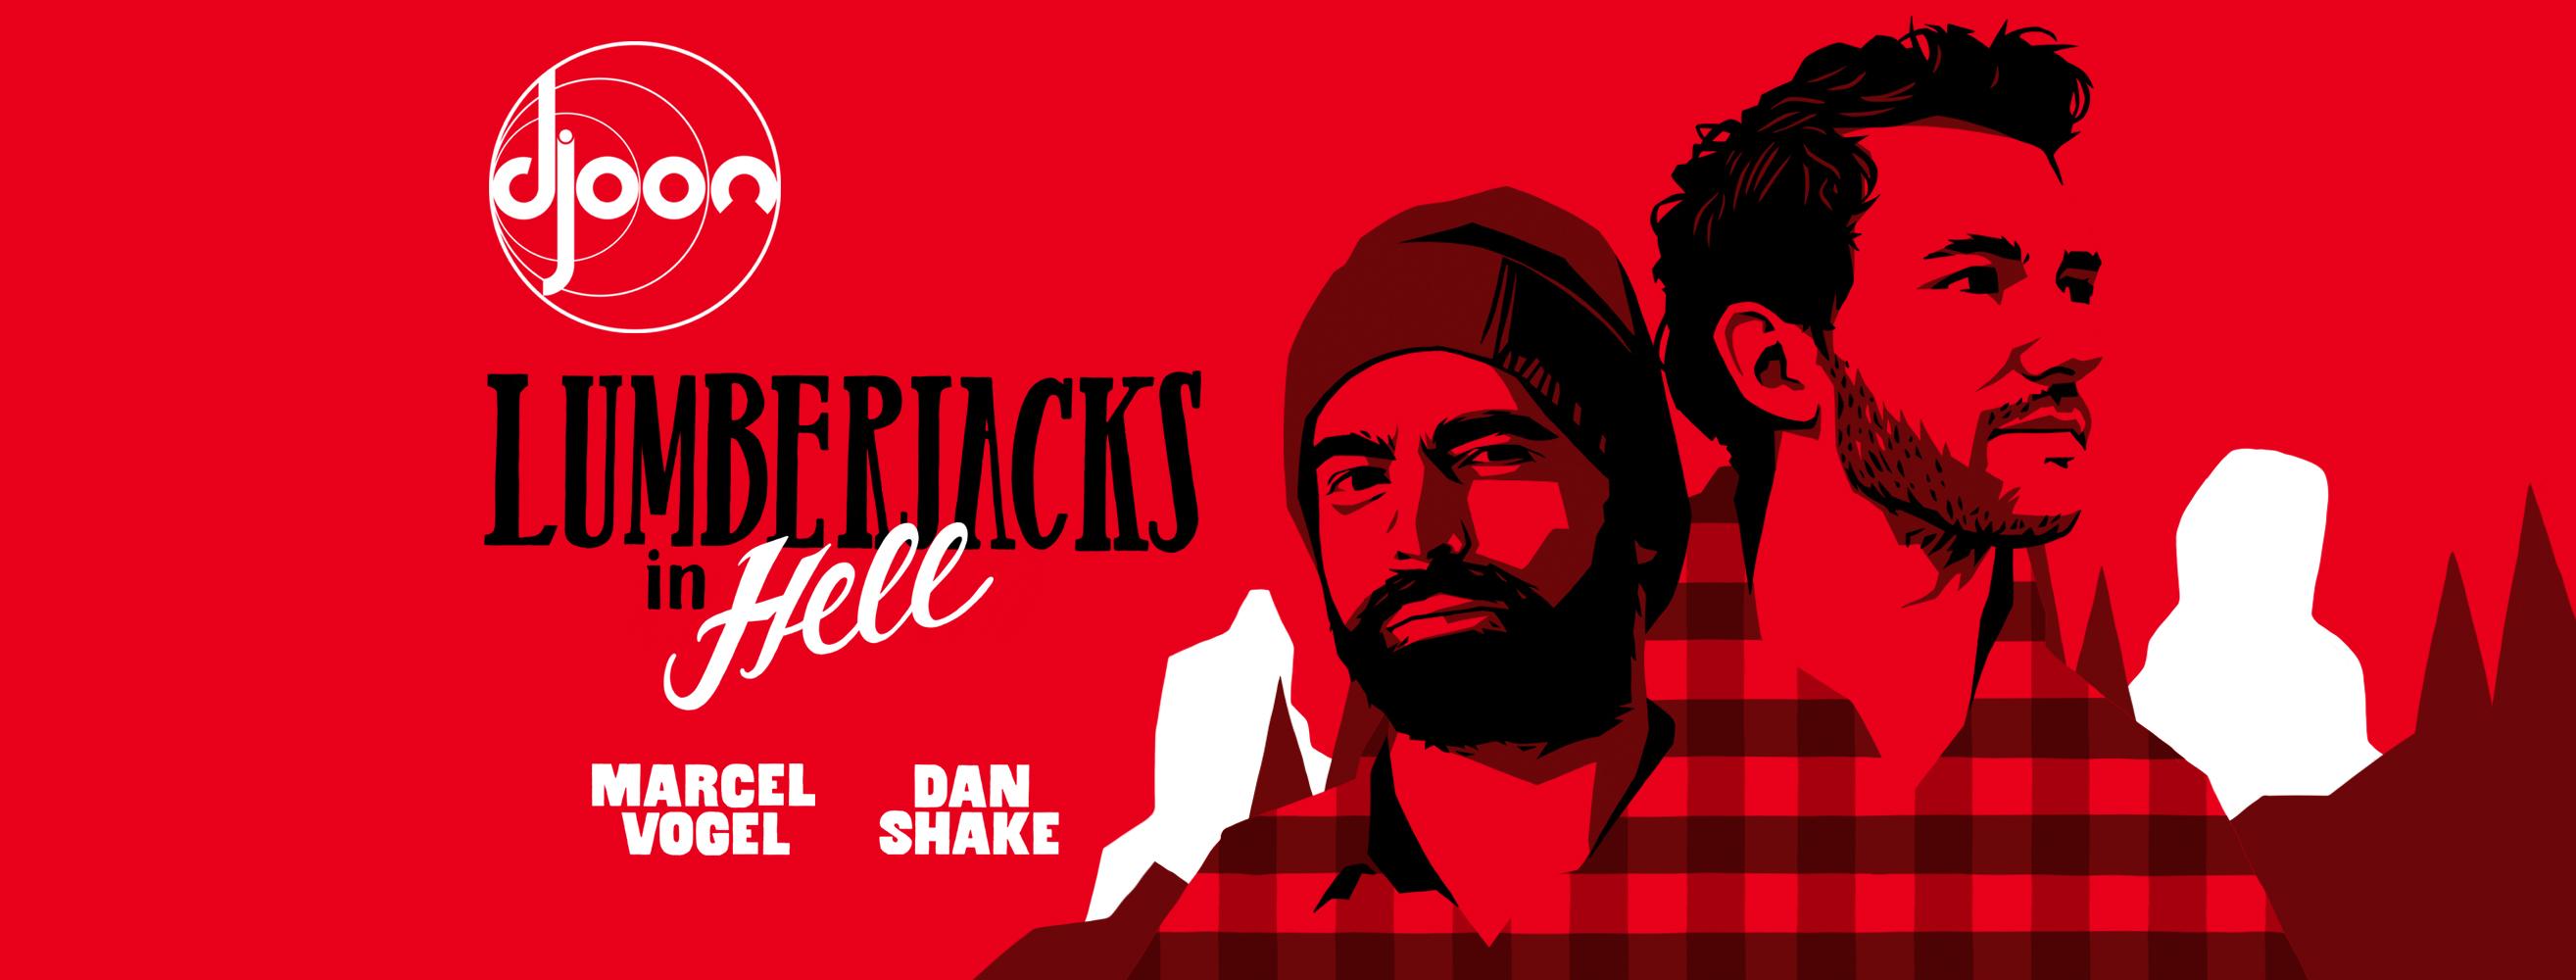 Lumberjacks in Hell: Marcel Vogel b2b Dan Shake